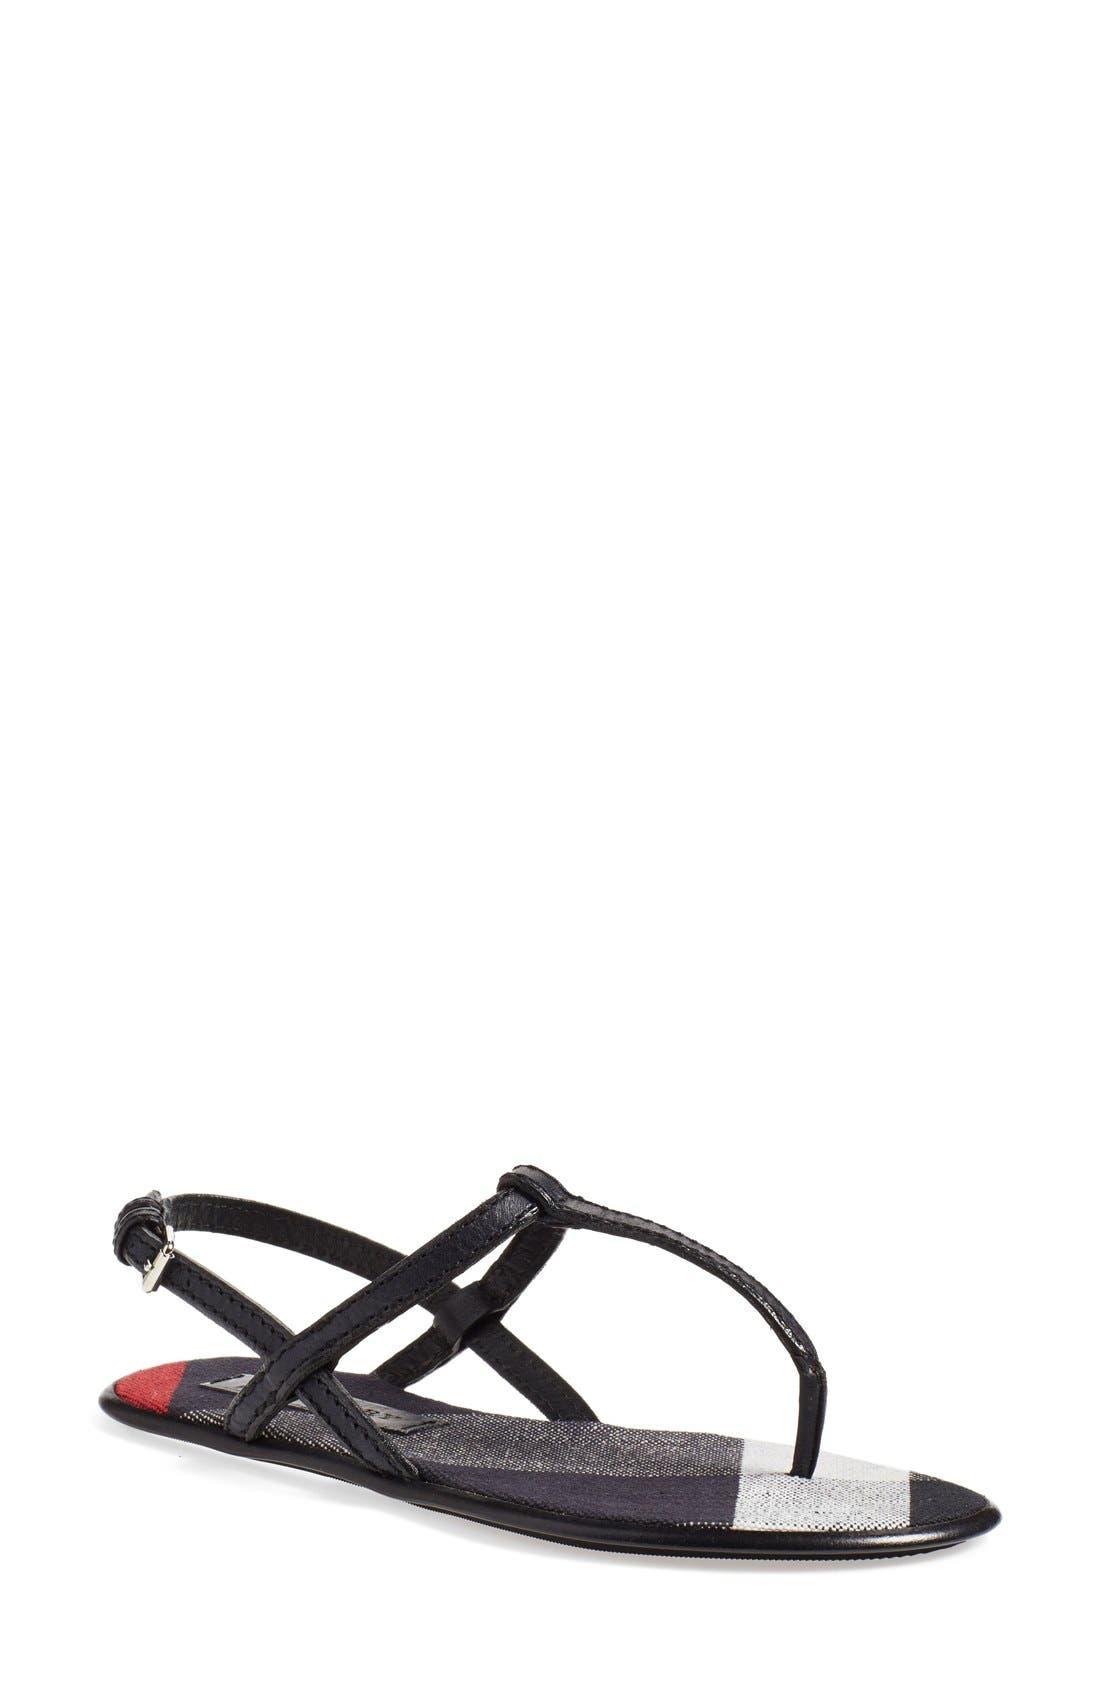 Alternate Image 1 Selected - Burberry 'Ingeldew' T-Strap Sandal (Women)